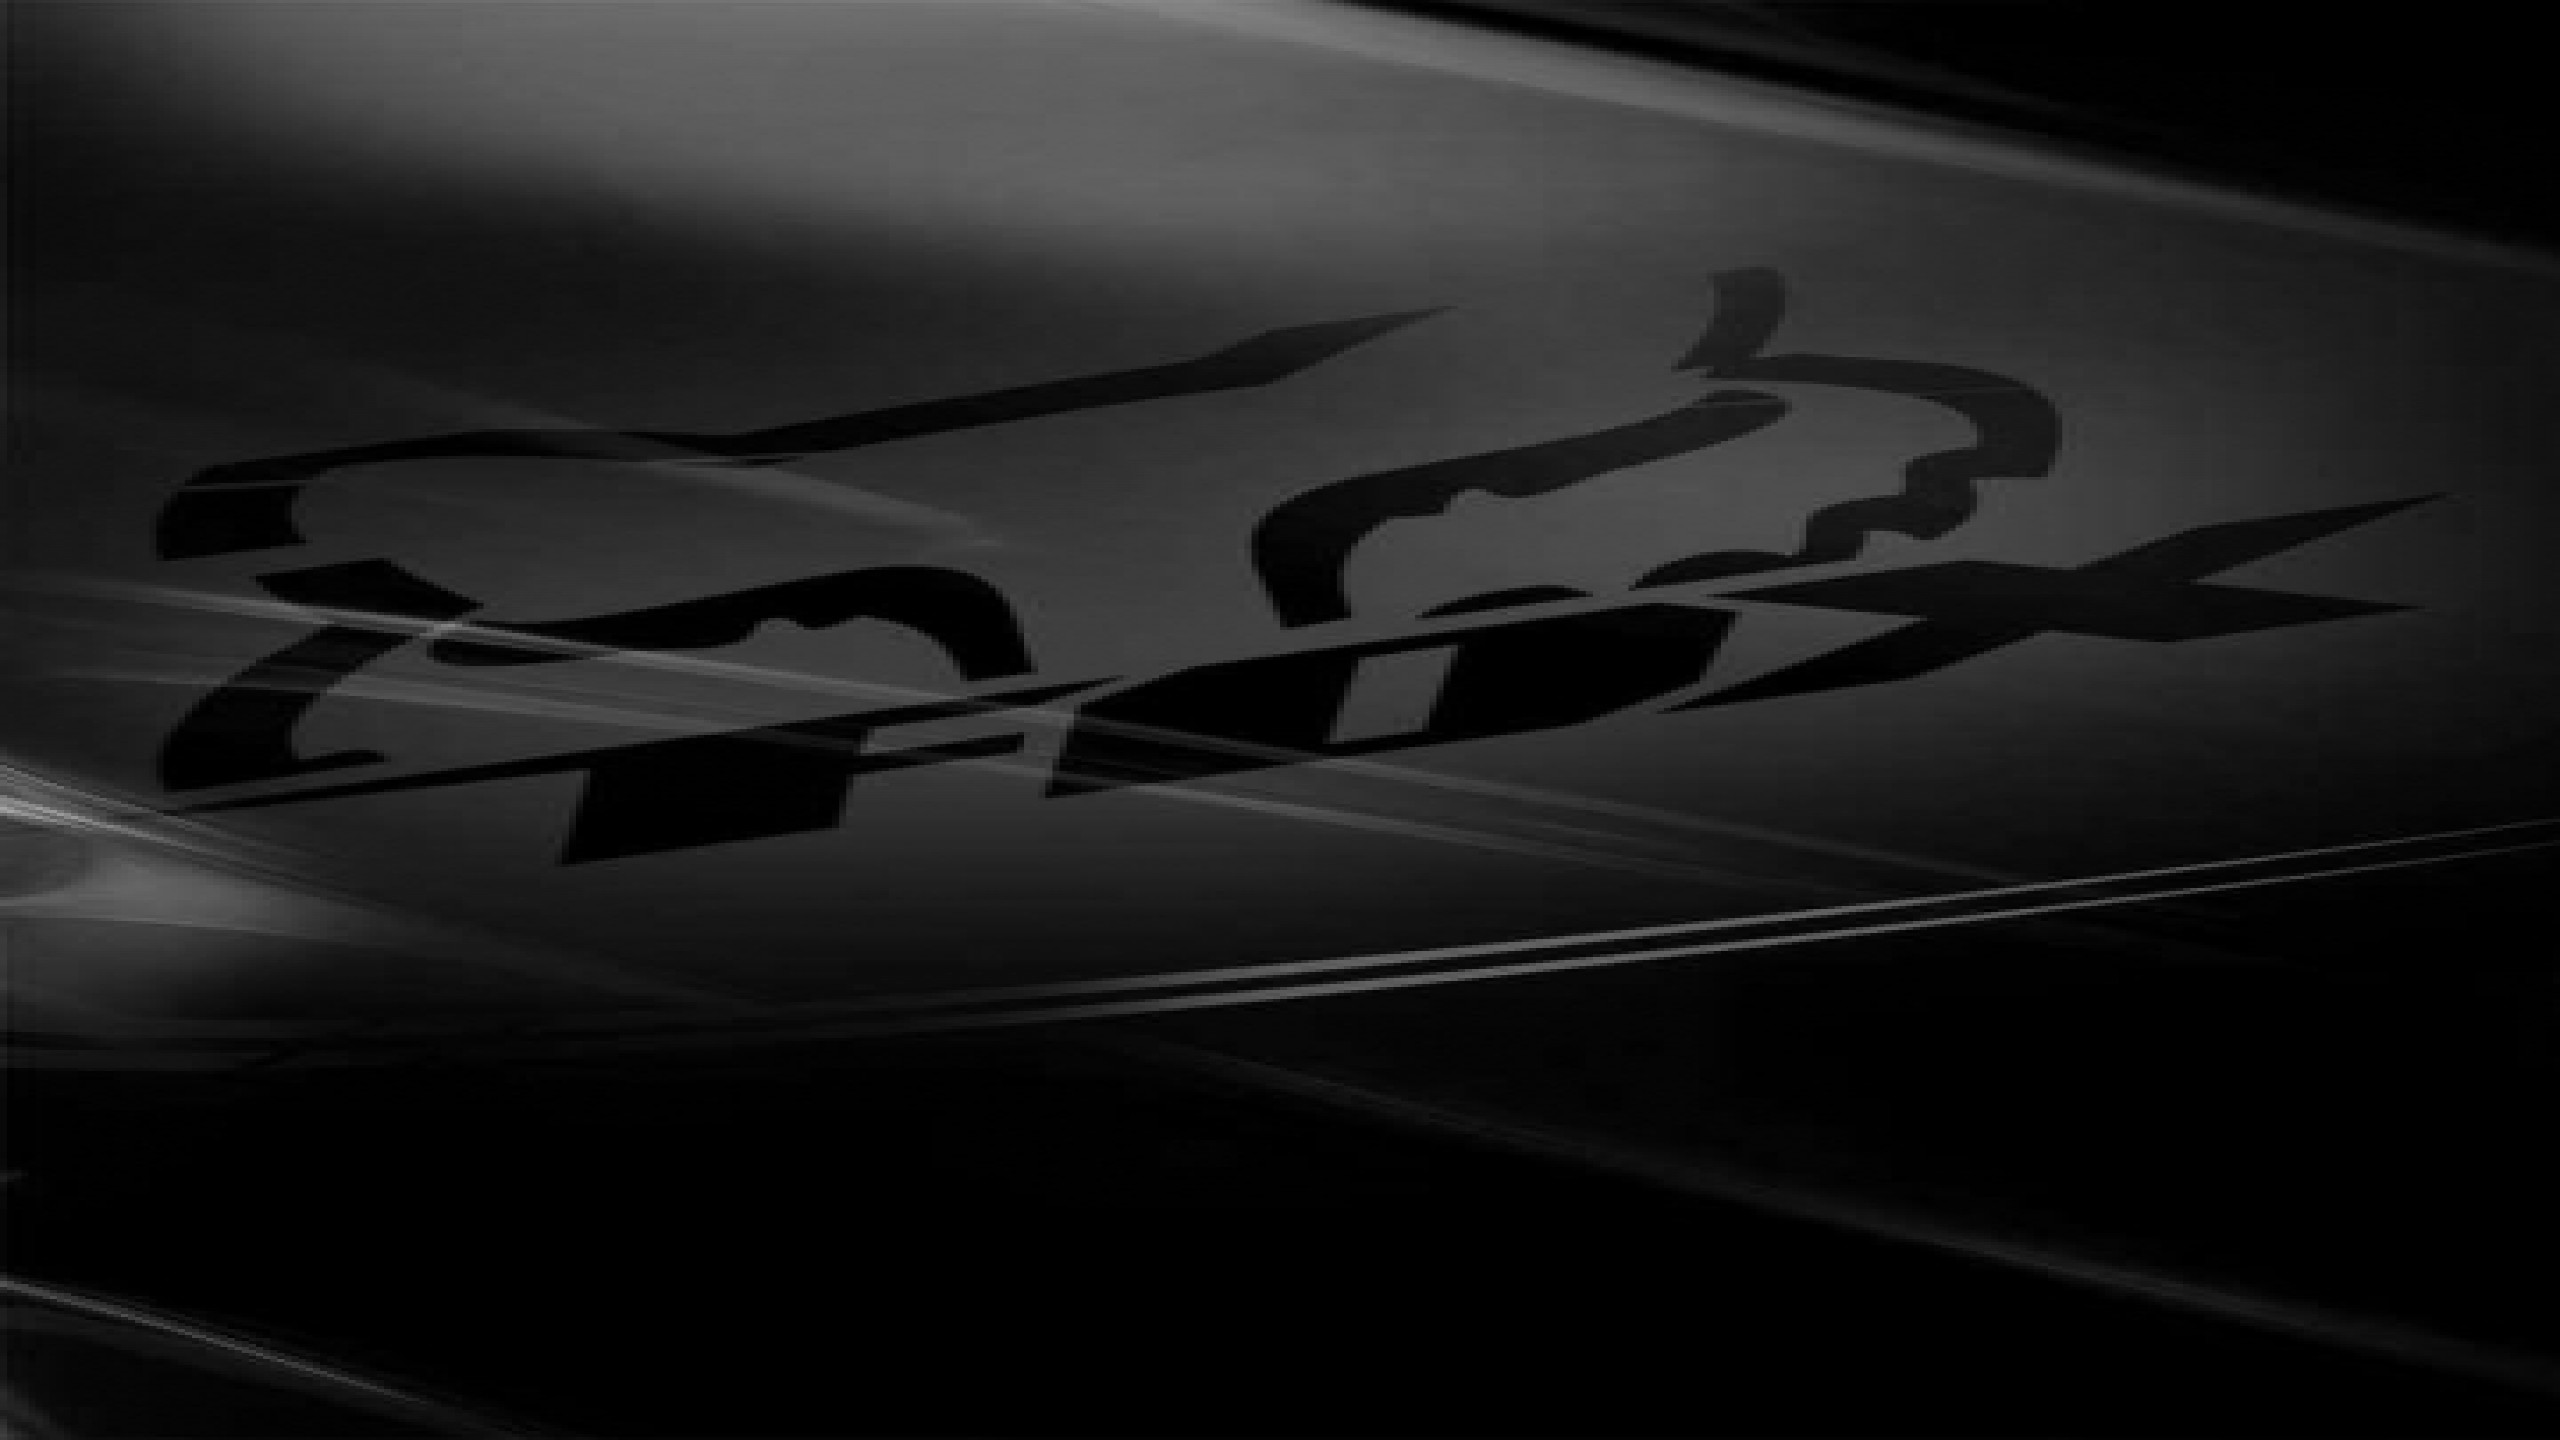 fox racing logo wallpaper 183��